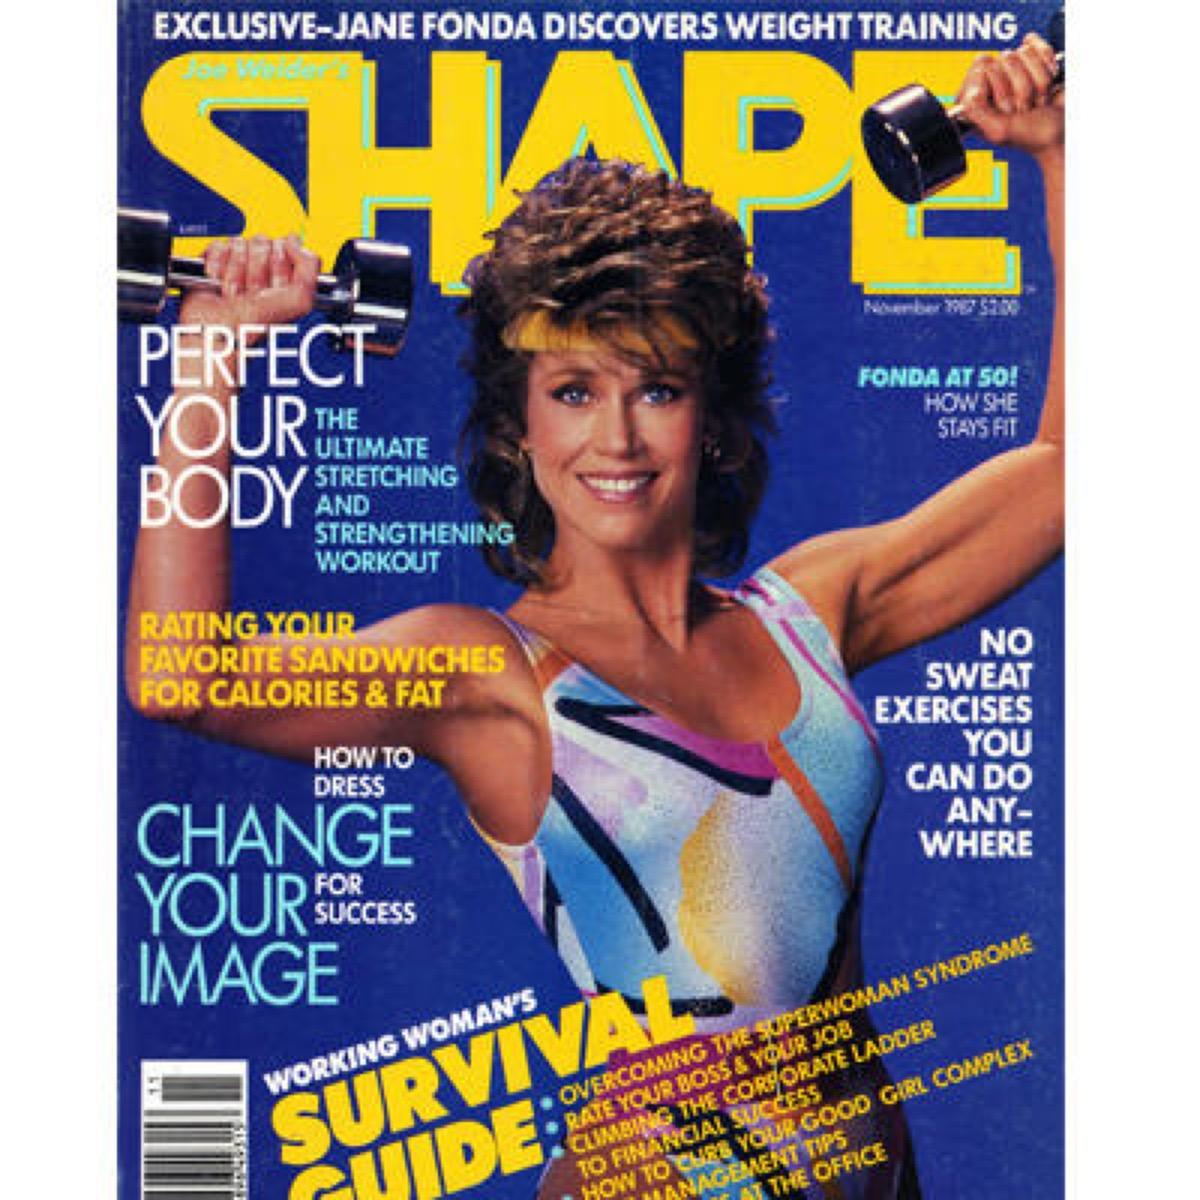 jane fona workout magazine cover for shape, 1980s nostalgia